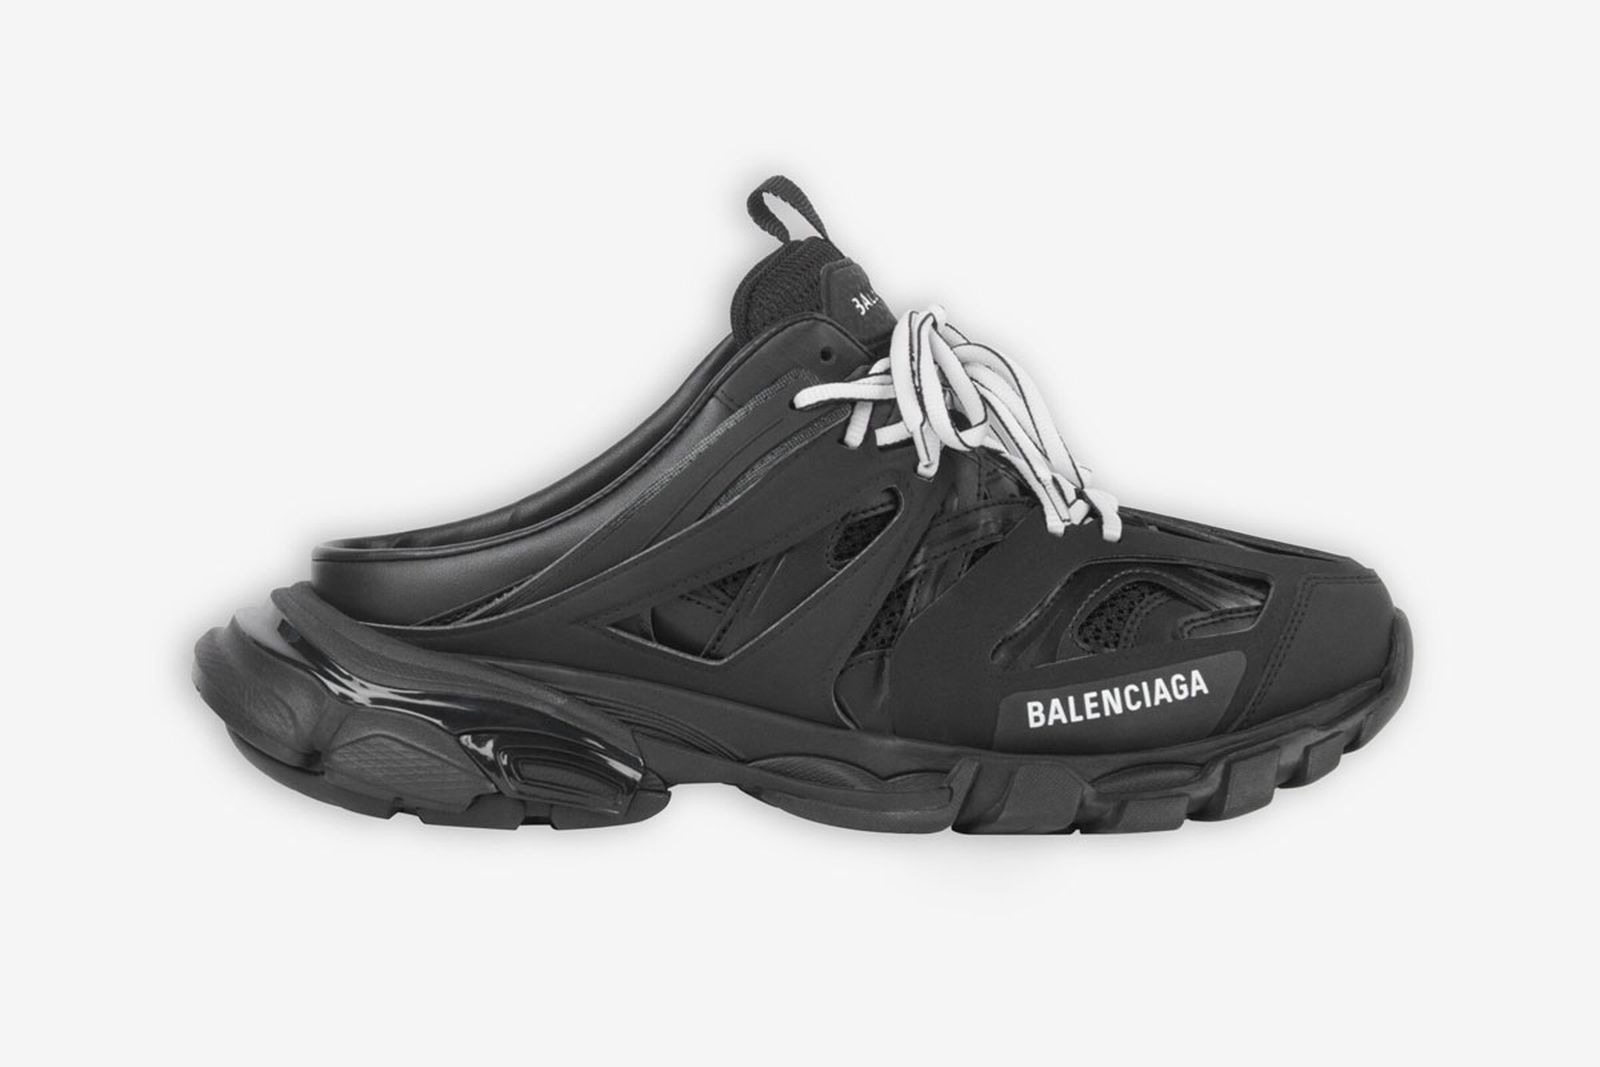 balenciaga-track-mule-release-date-price-01